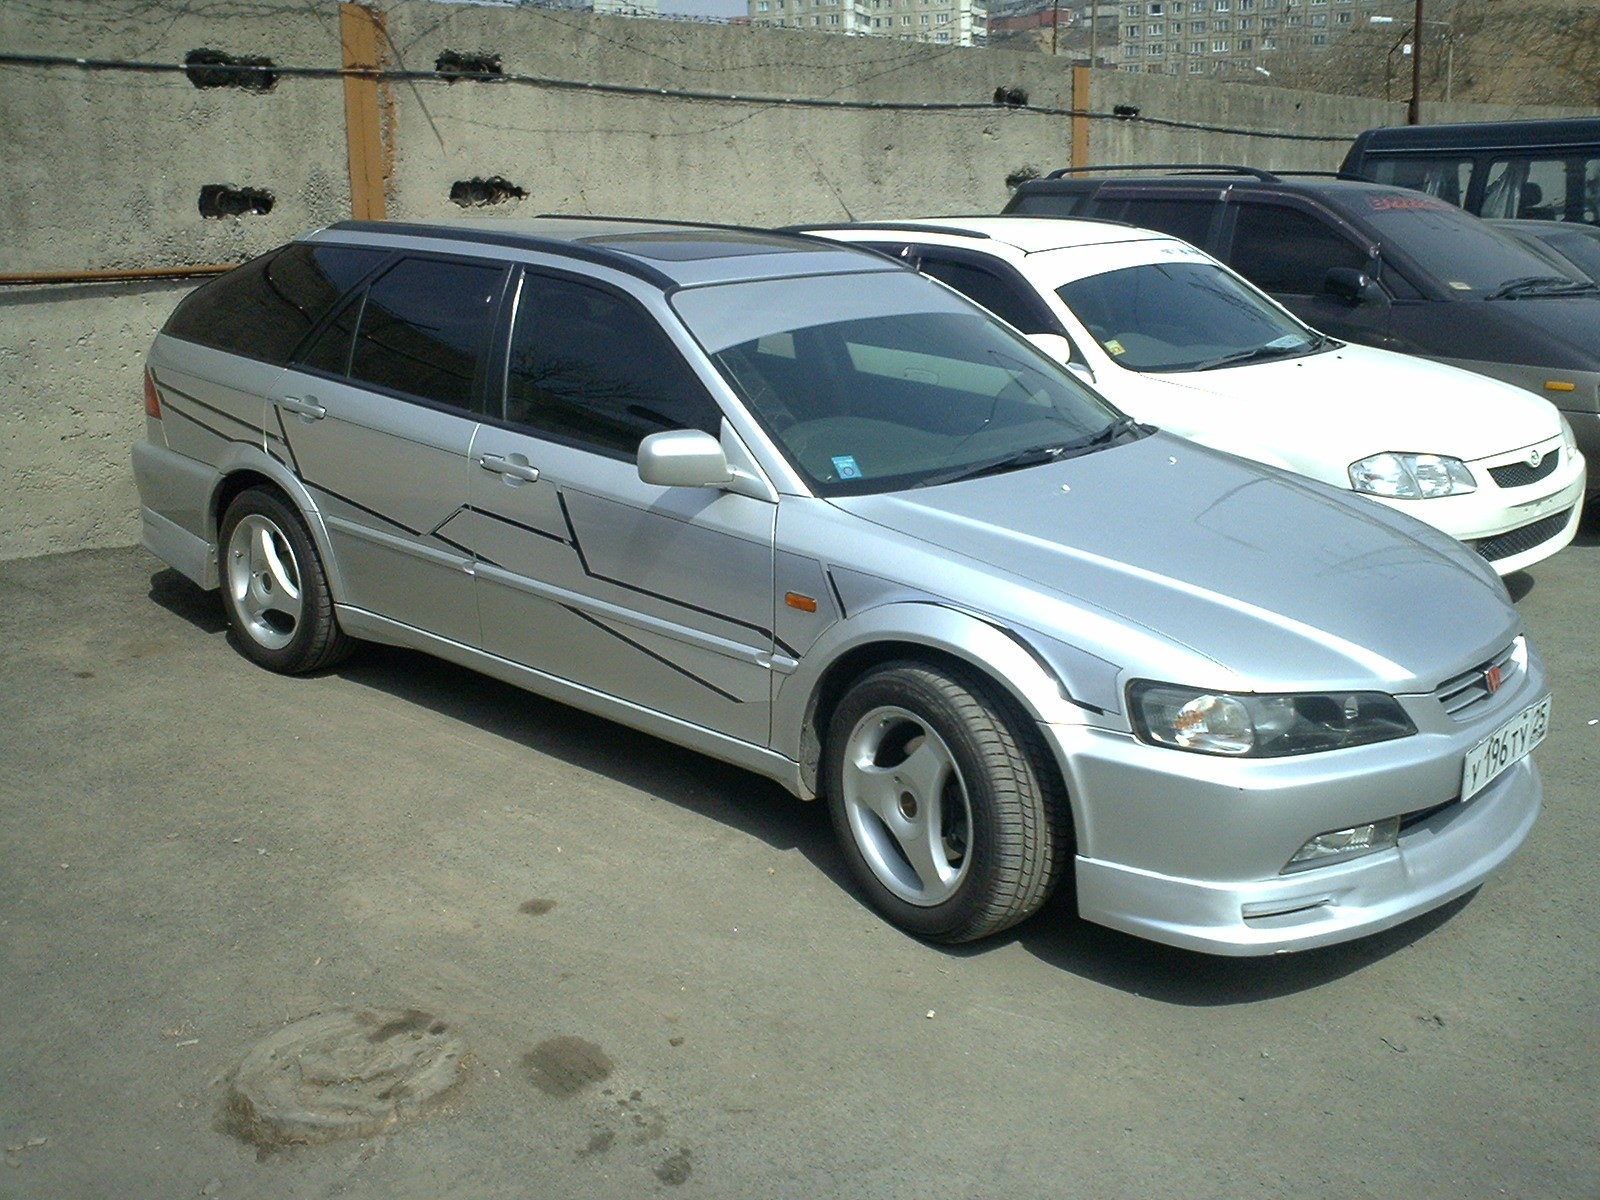 1998 Honda Accord For Sale >> 1998 Honda Accord Wagon Pictures, 2300cc., Gasoline, FF, Automatic For Sale